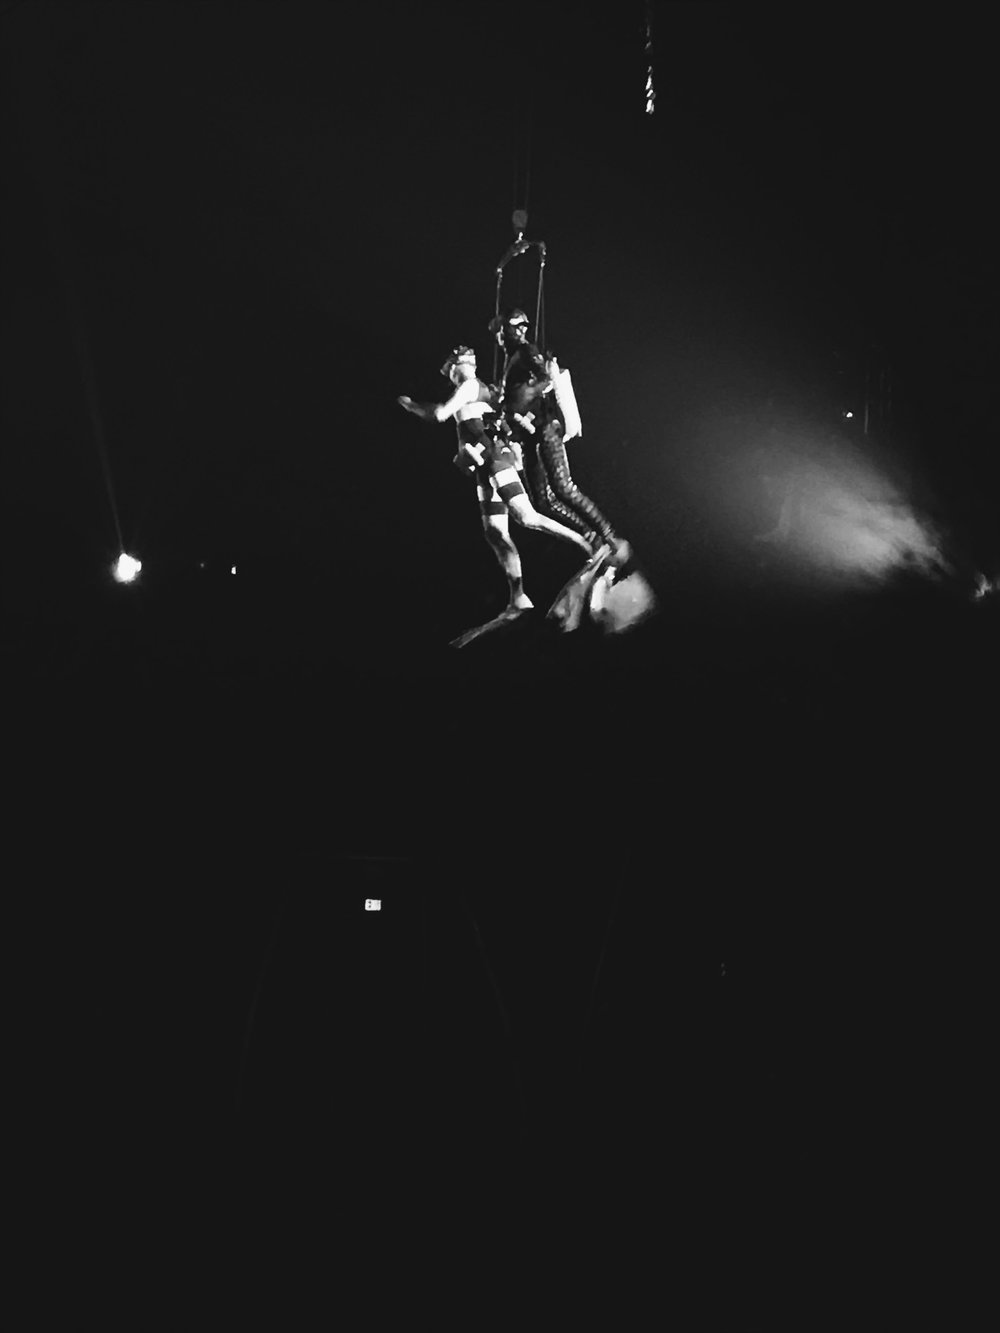 Scuba Steve with the Clown at Luzia by Cirque Du Soleil in Costa Mesa, CA.